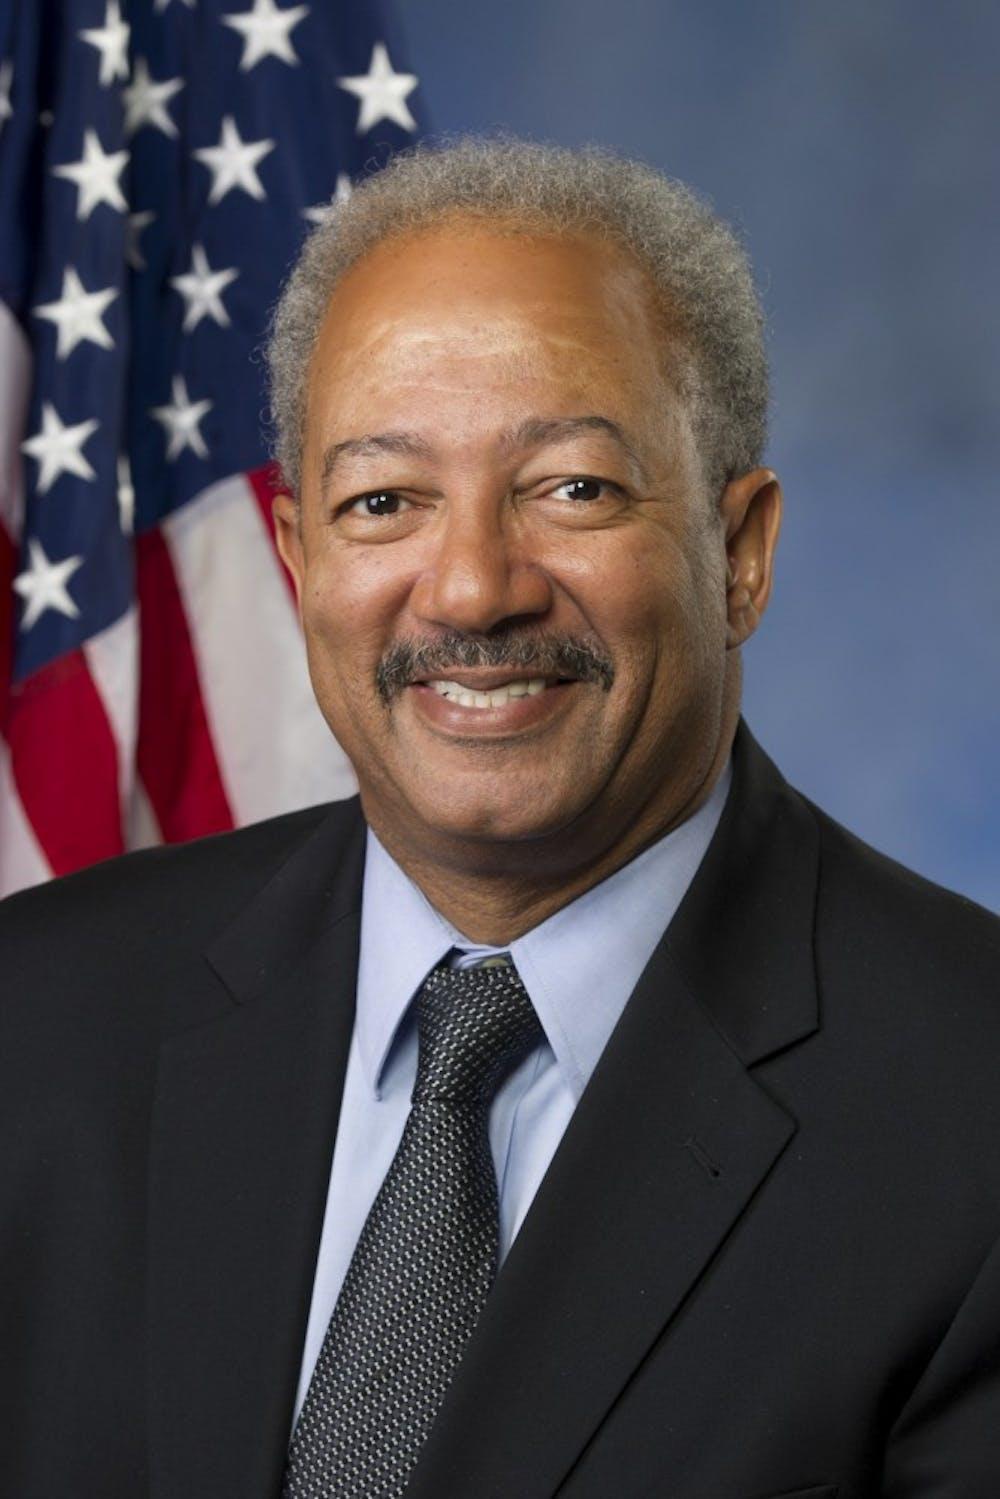 <p>Rep. Chaka Fattah | Official House of Representatives Photo</p>